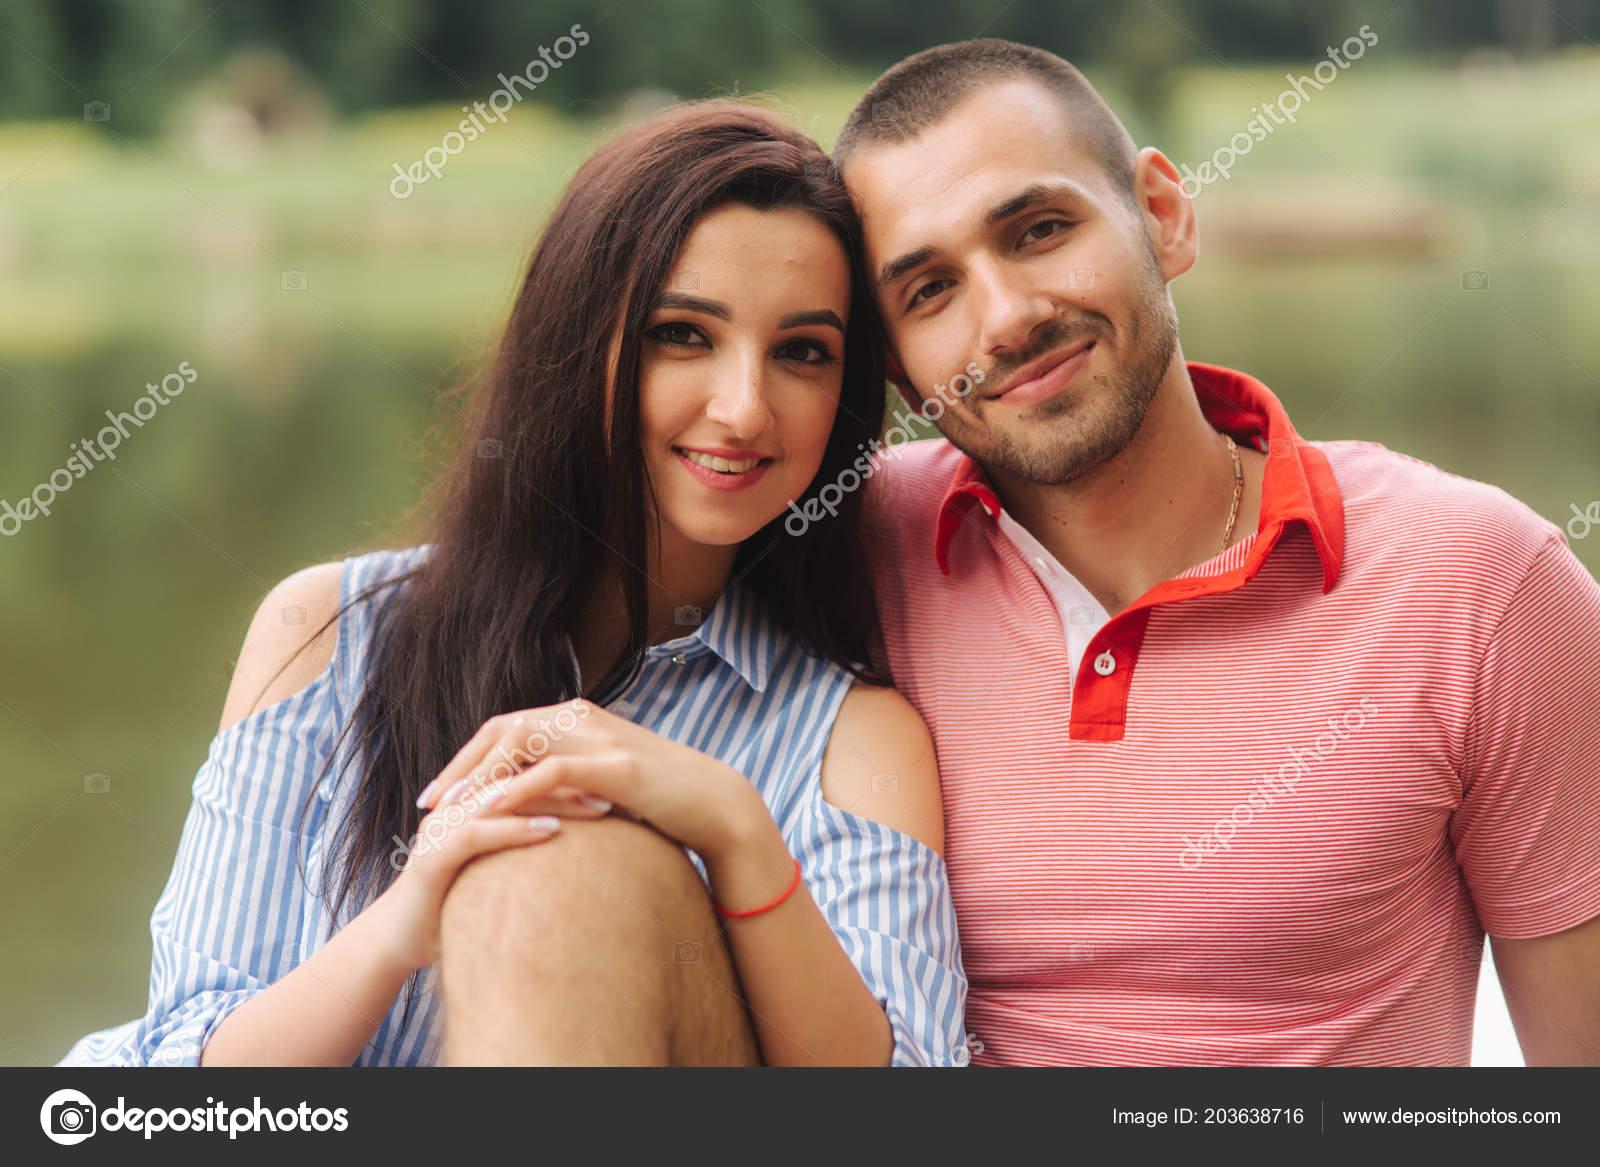 Kaukasische dating in Singapore alcanda match maken